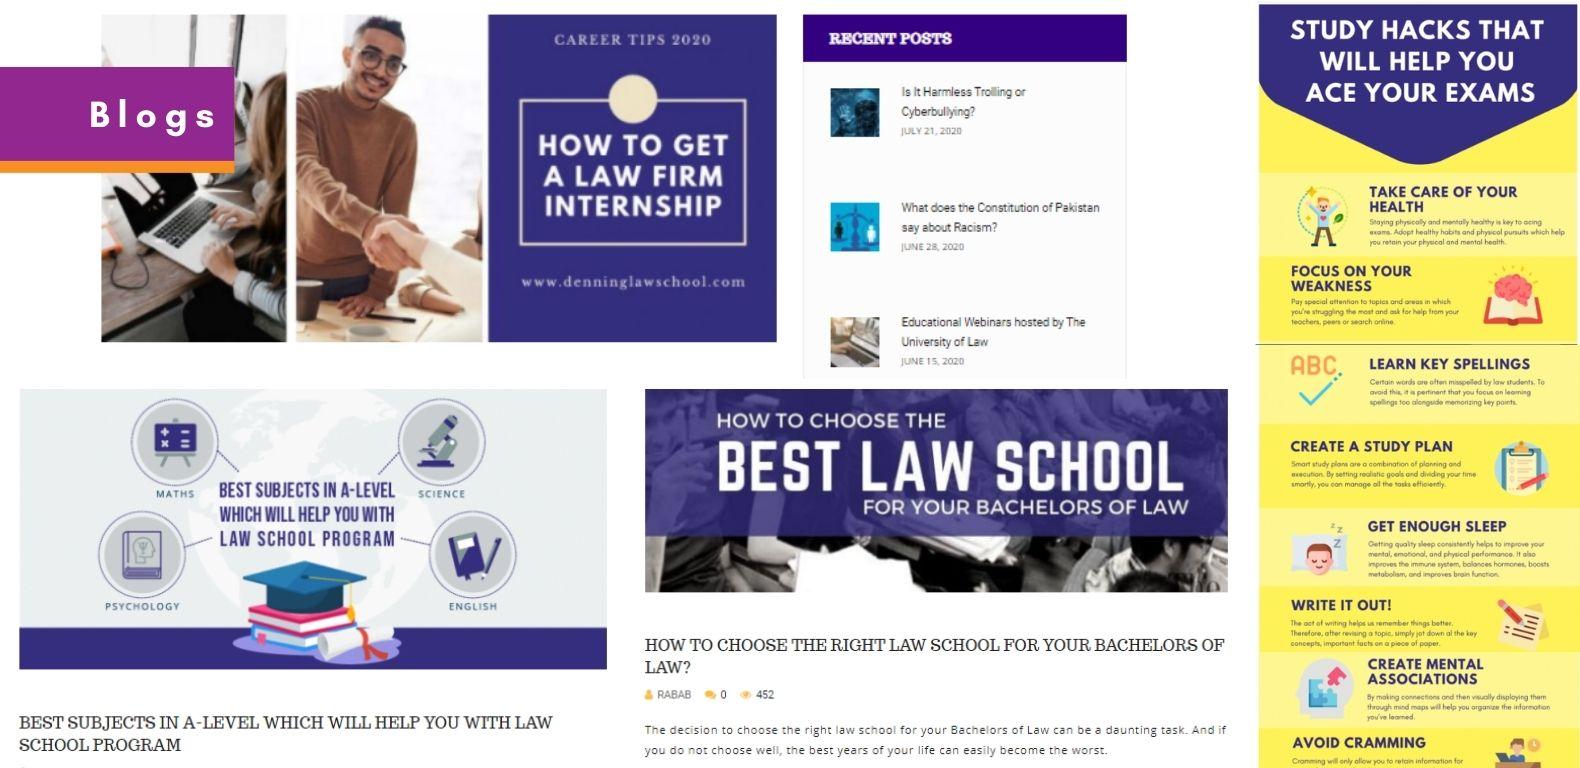 SEO-Denning-Law-School-Blog-Posts